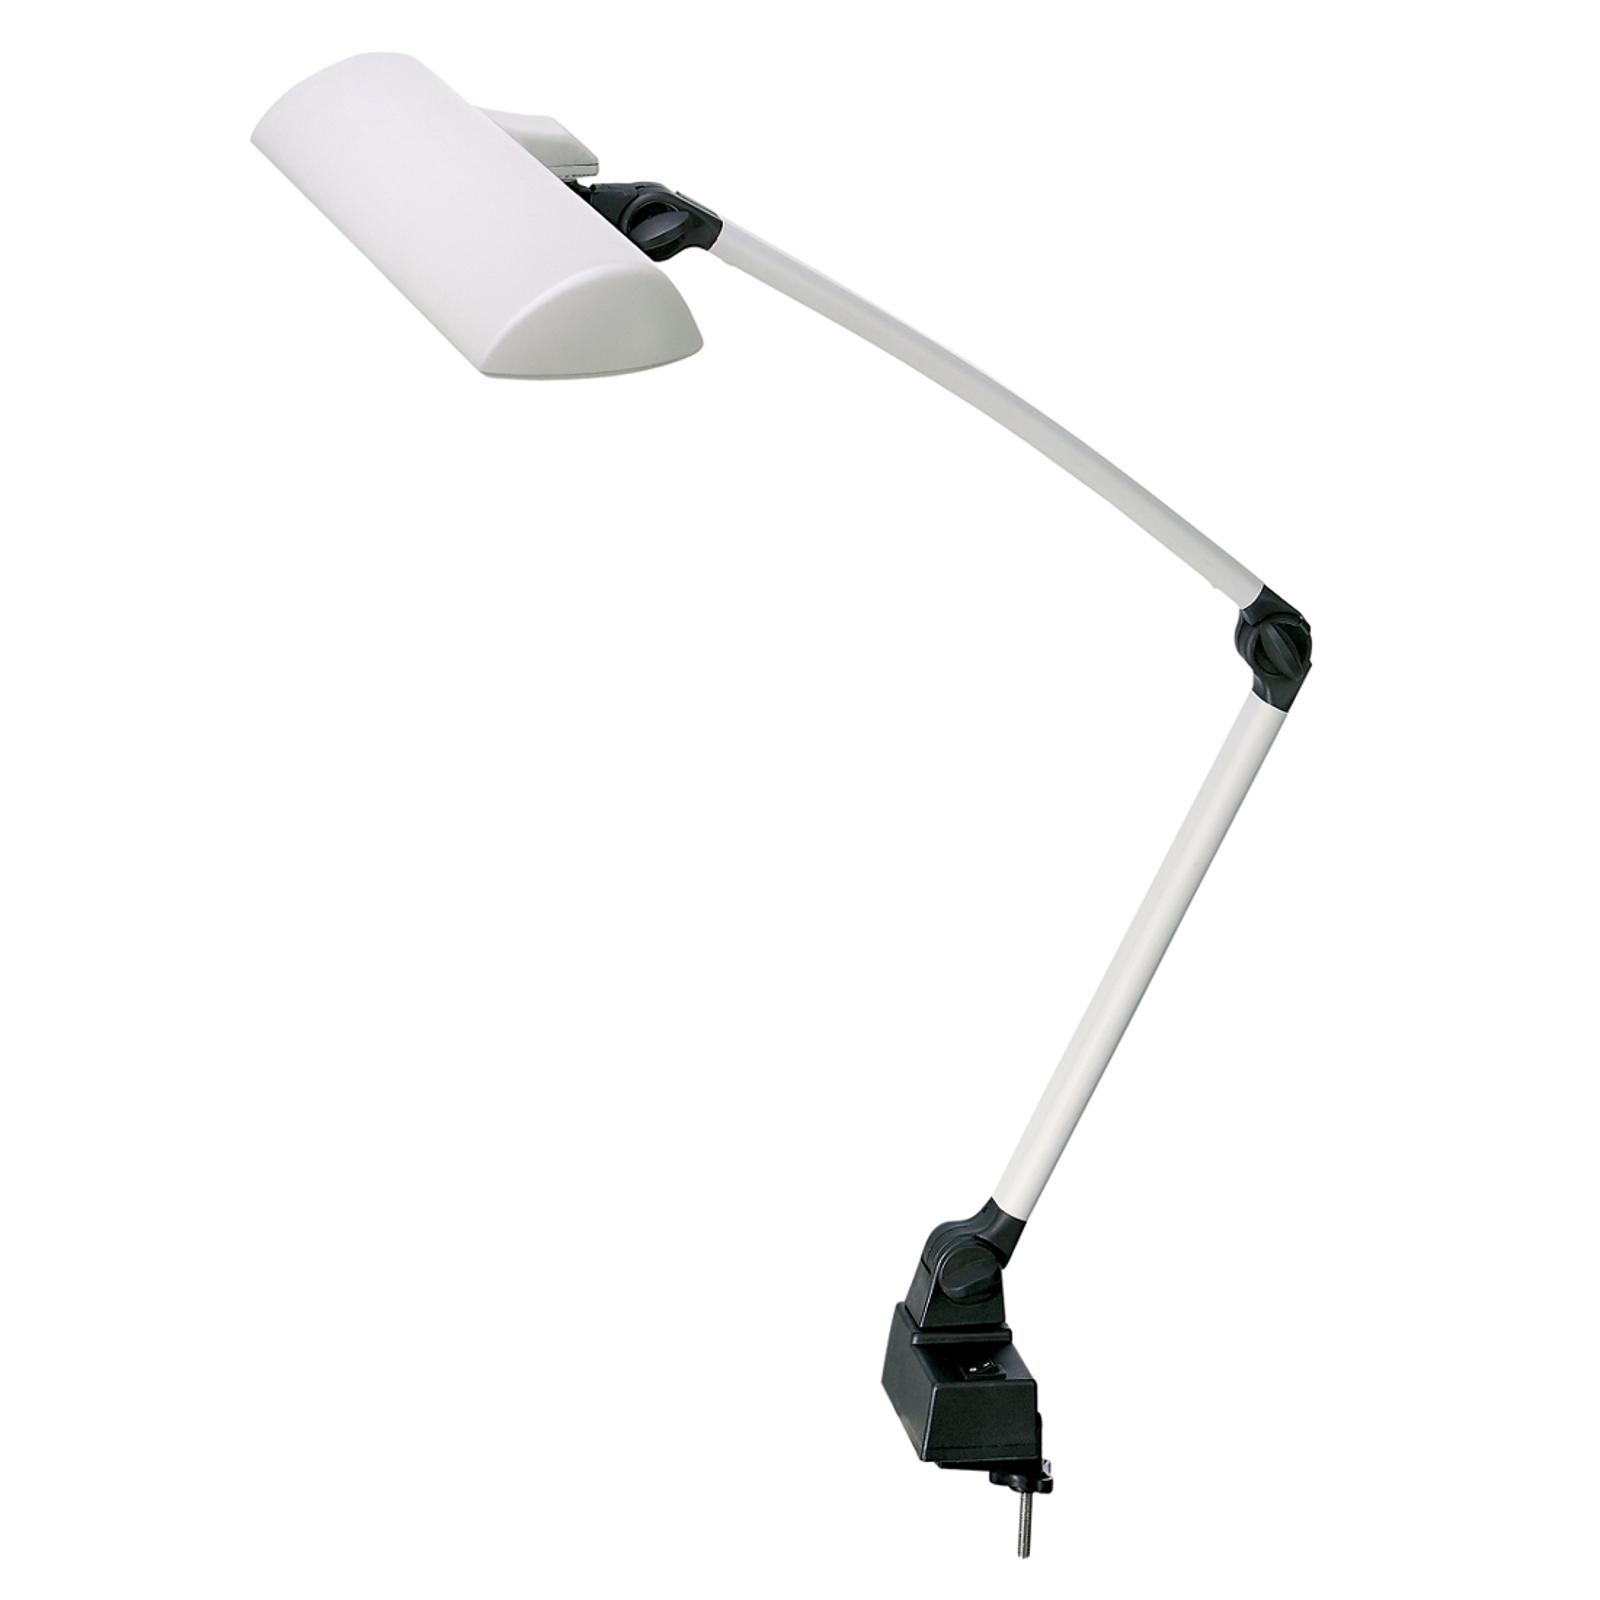 Lampa do pracy CLIP jasnoszara